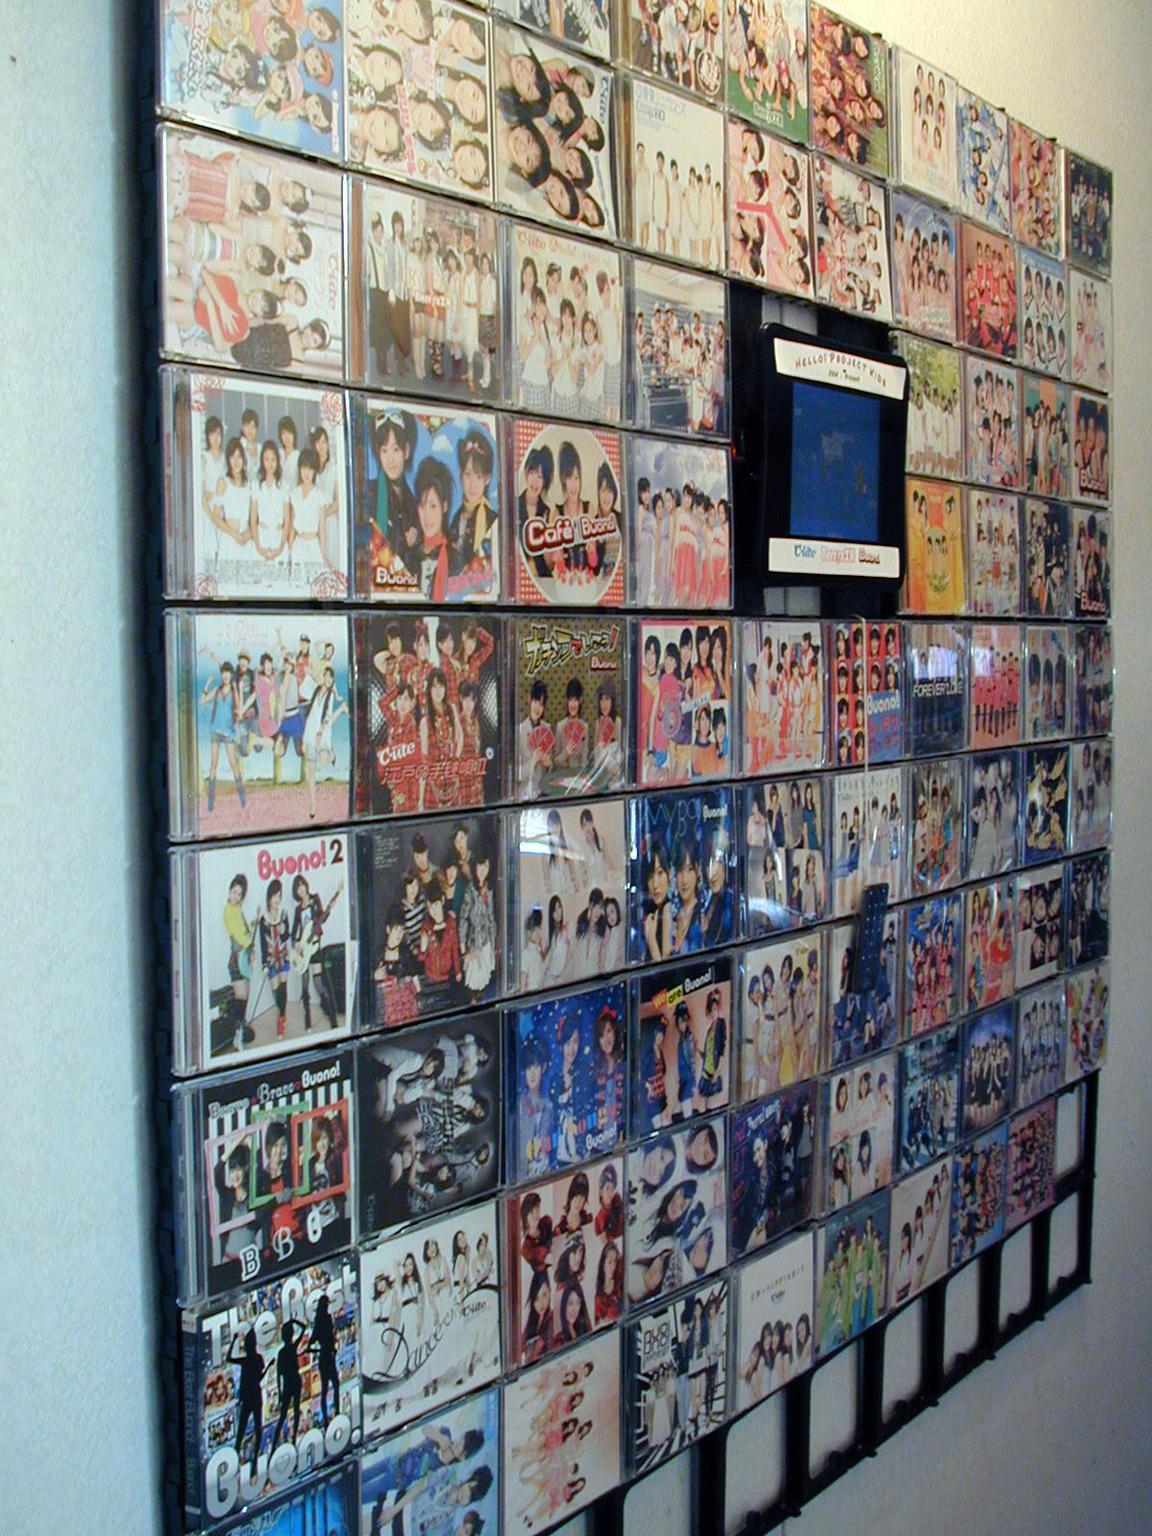 Berryz/C-ute/Buono! single discography wall display